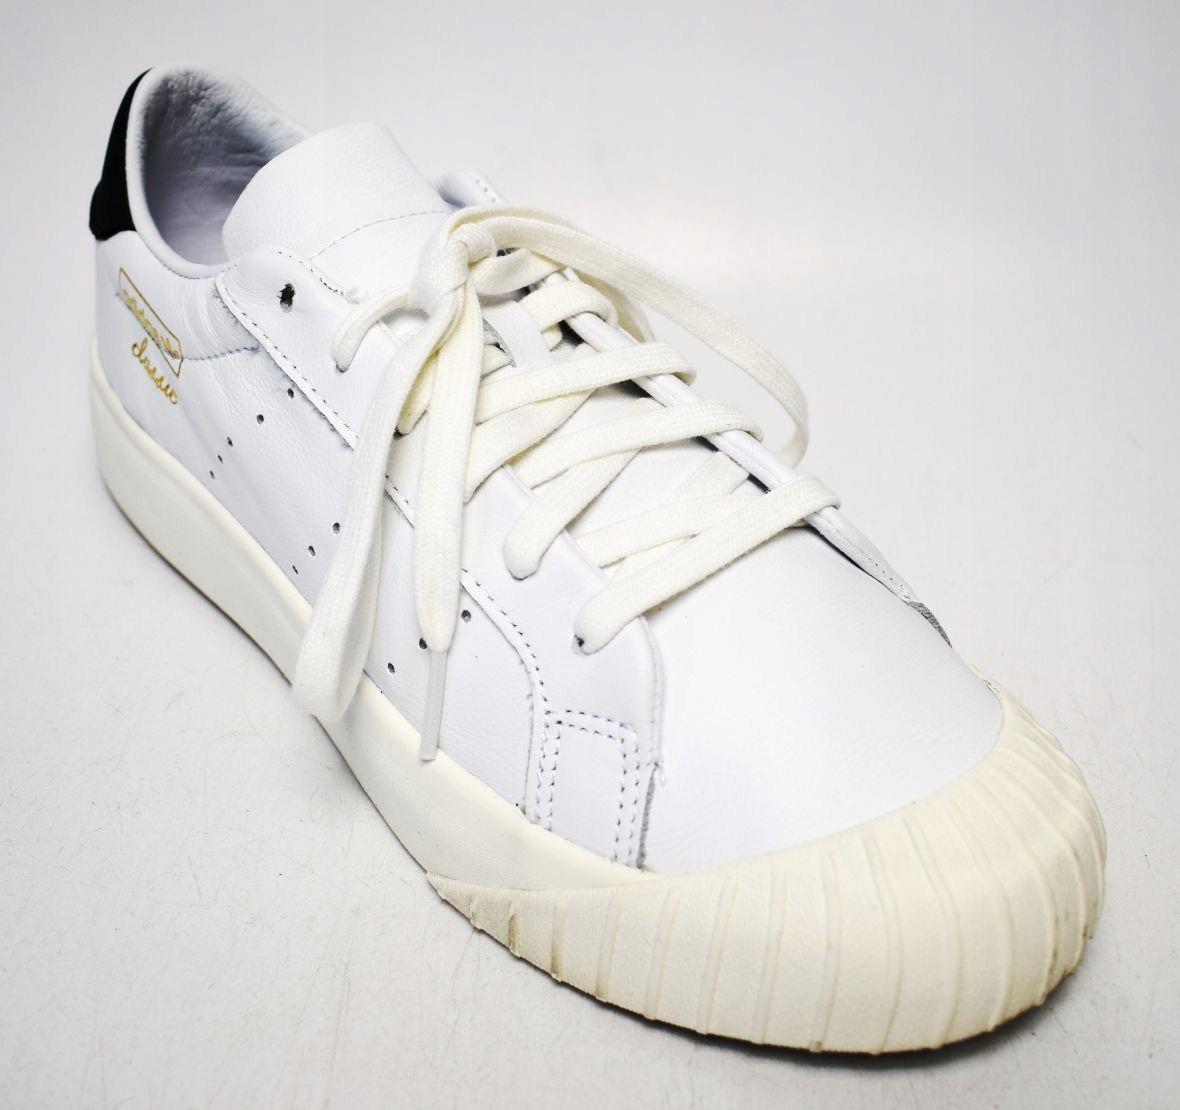 new products cc2c3 32884 Adidas Everyn BUTY SPORTOWE damskie 39 13 (7595919310)